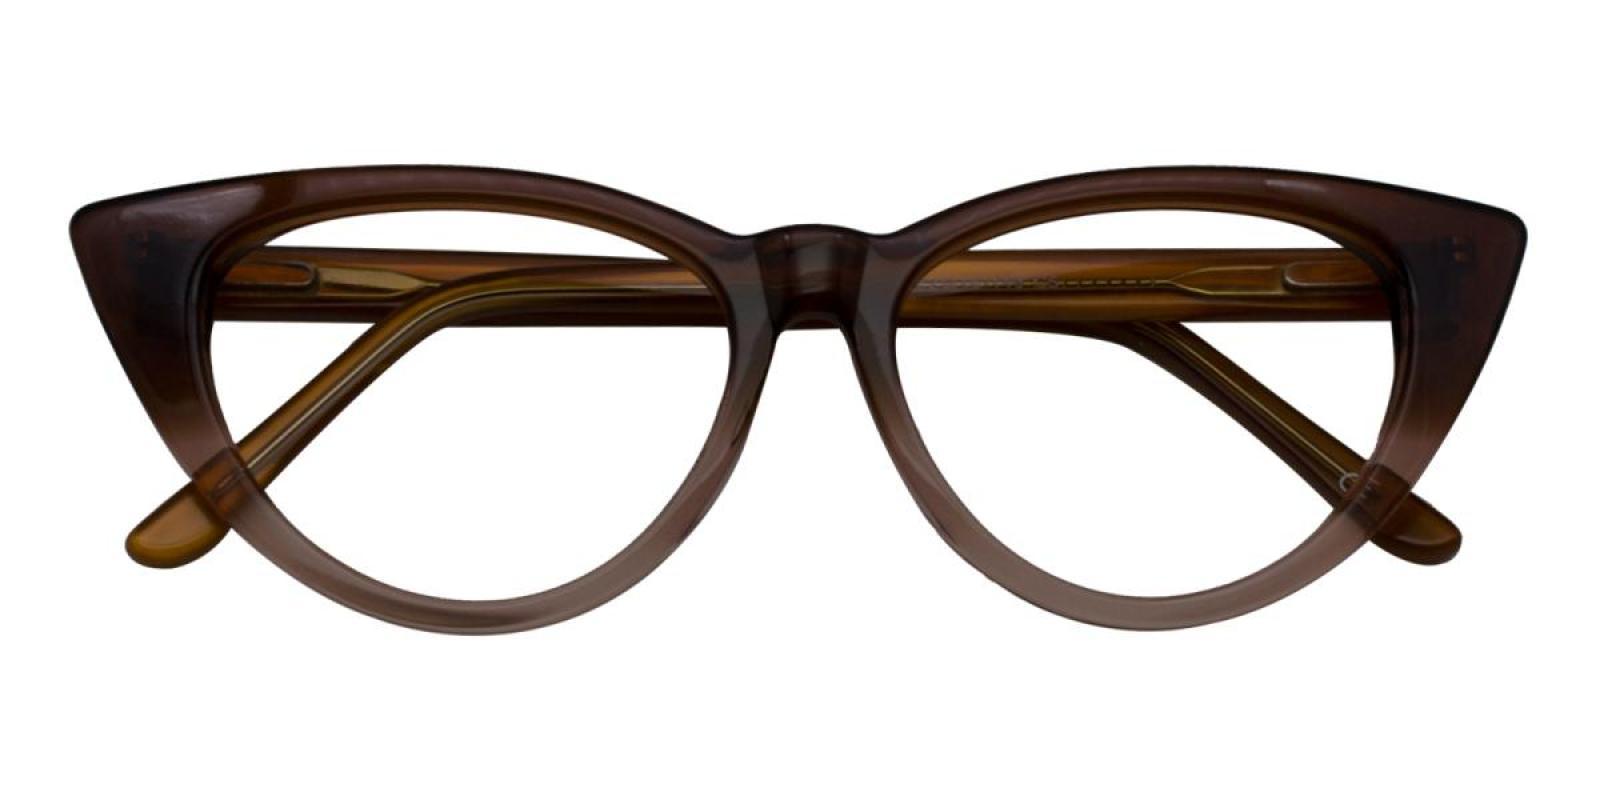 Charm-Brown-Cat-Acetate-Eyeglasses-detail